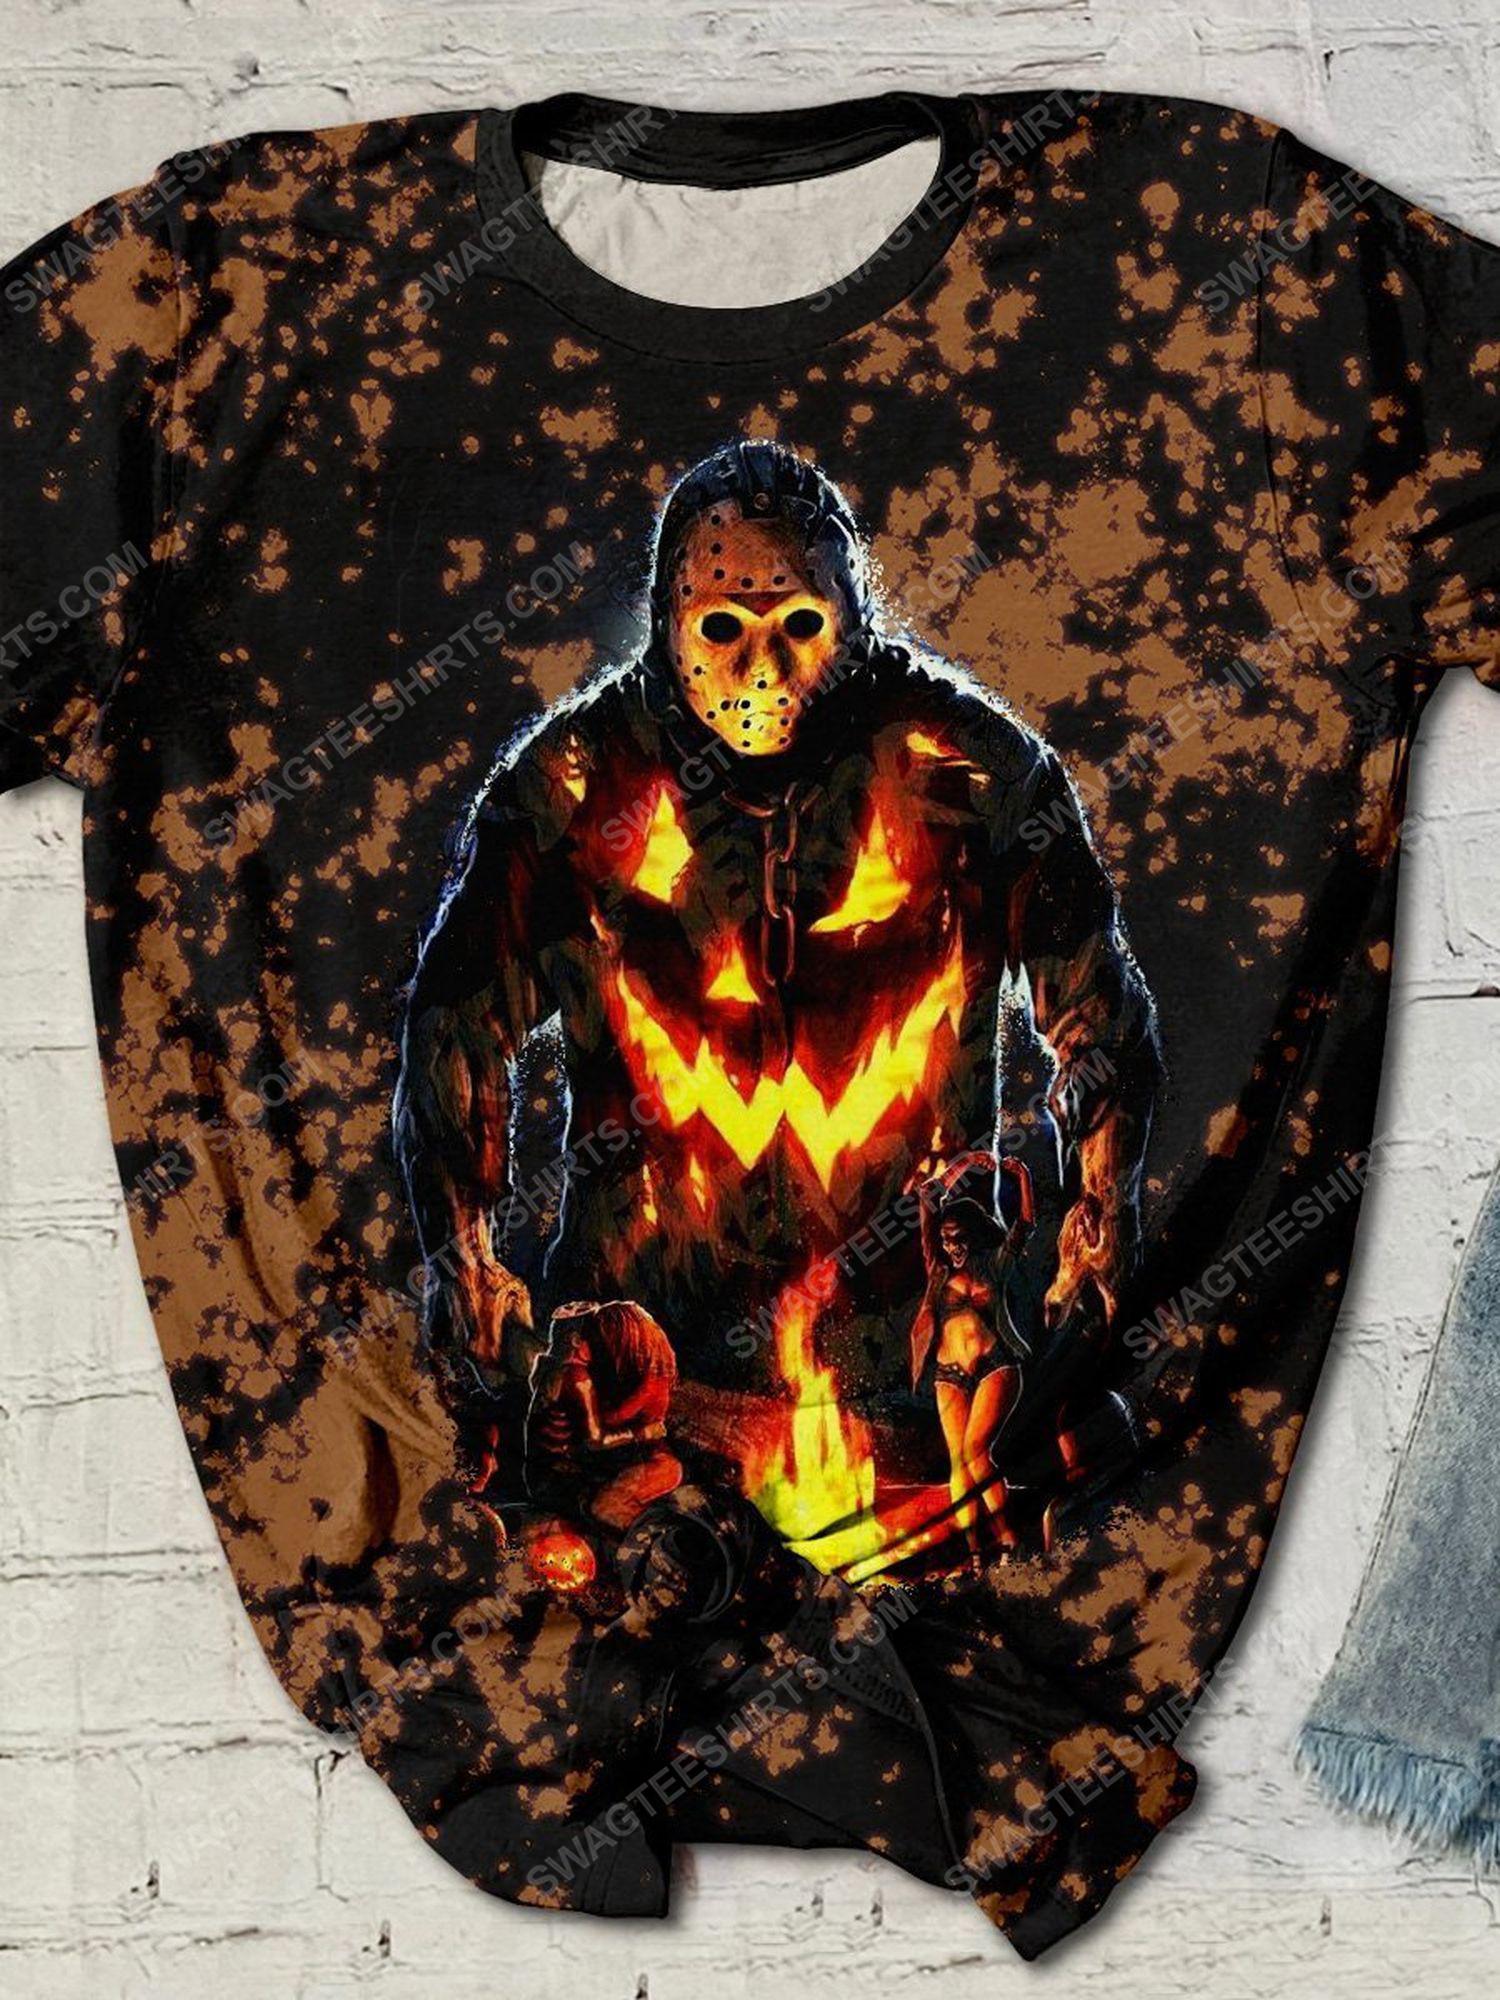 Halloween night jason voorhees friday the 13th shirt 1